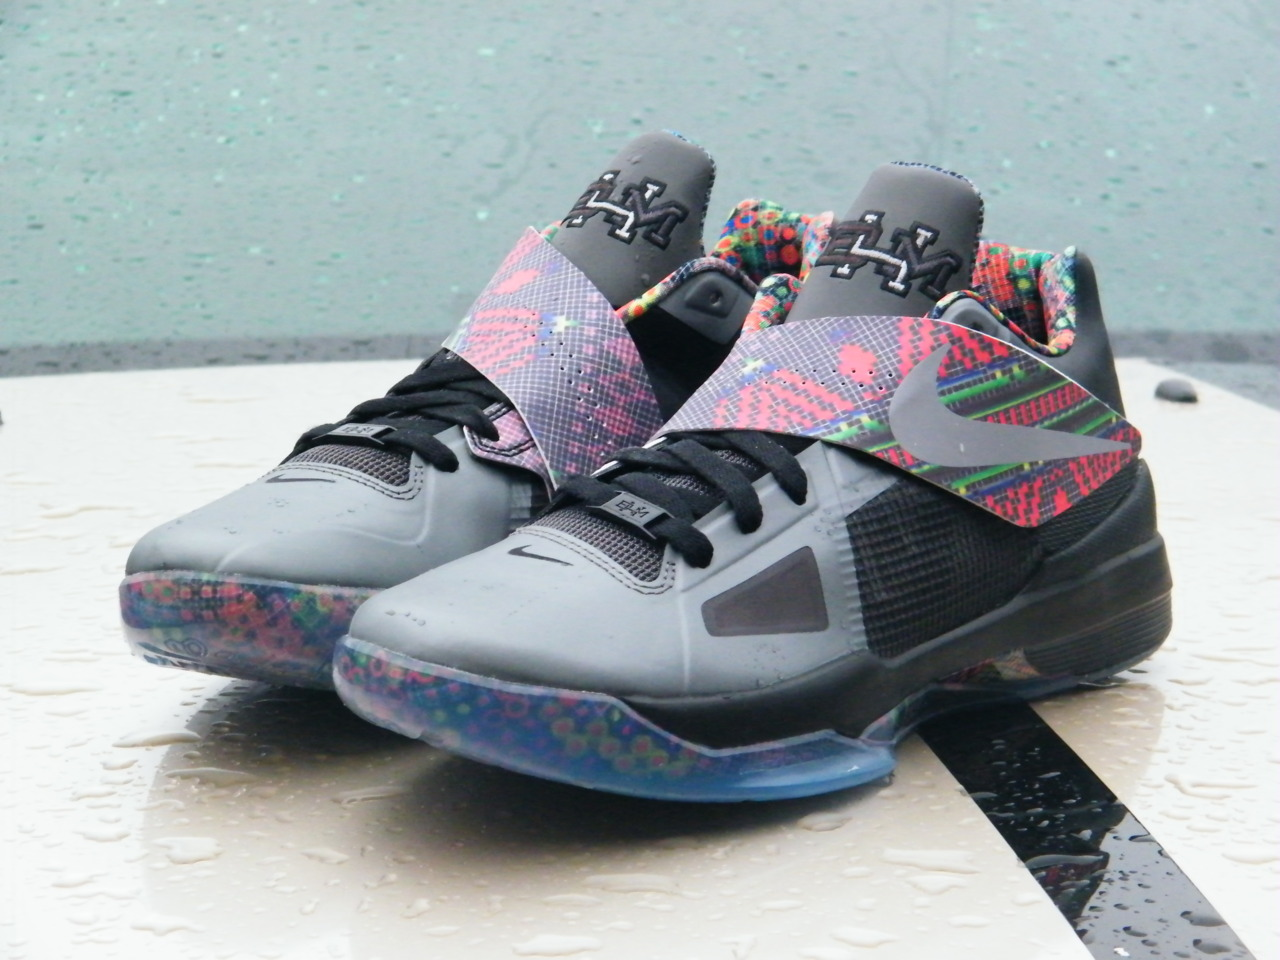 cdad4c1178f127 Nike Zoom KD IV  Black History Month